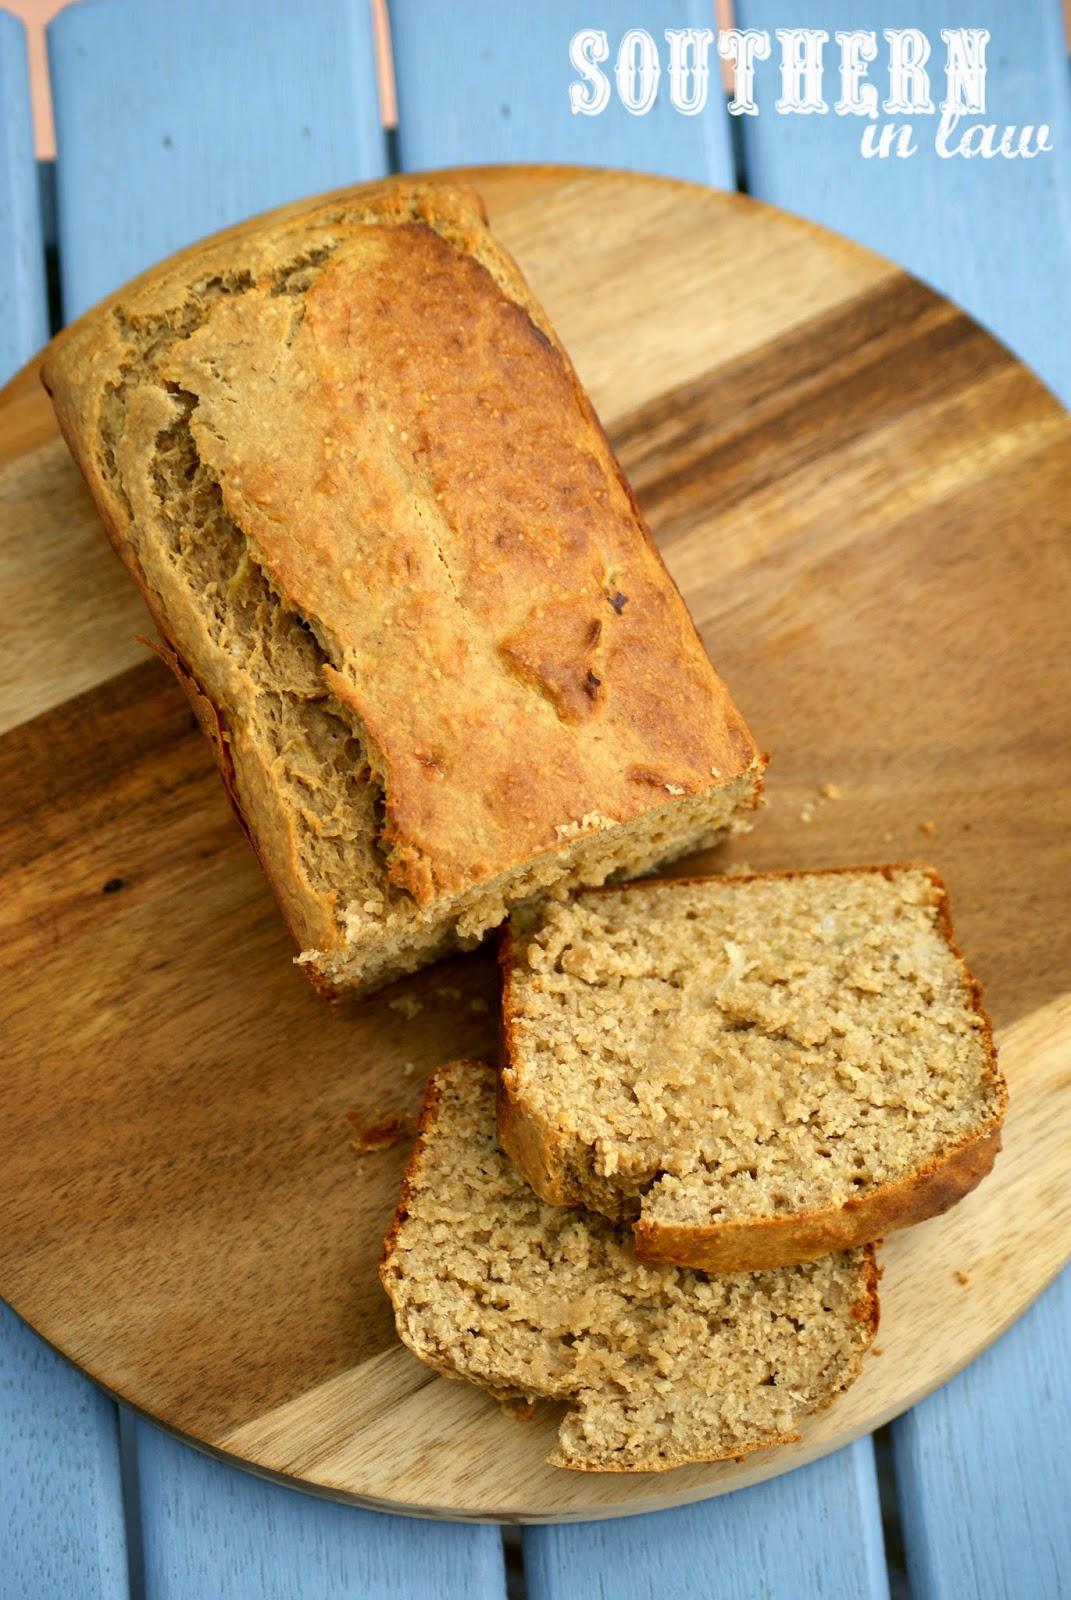 Healthy High Protein Banana Bread Recipe - low fat, gluten free, healthy, high protein, sugar free, freezable recipe, freezer recipe